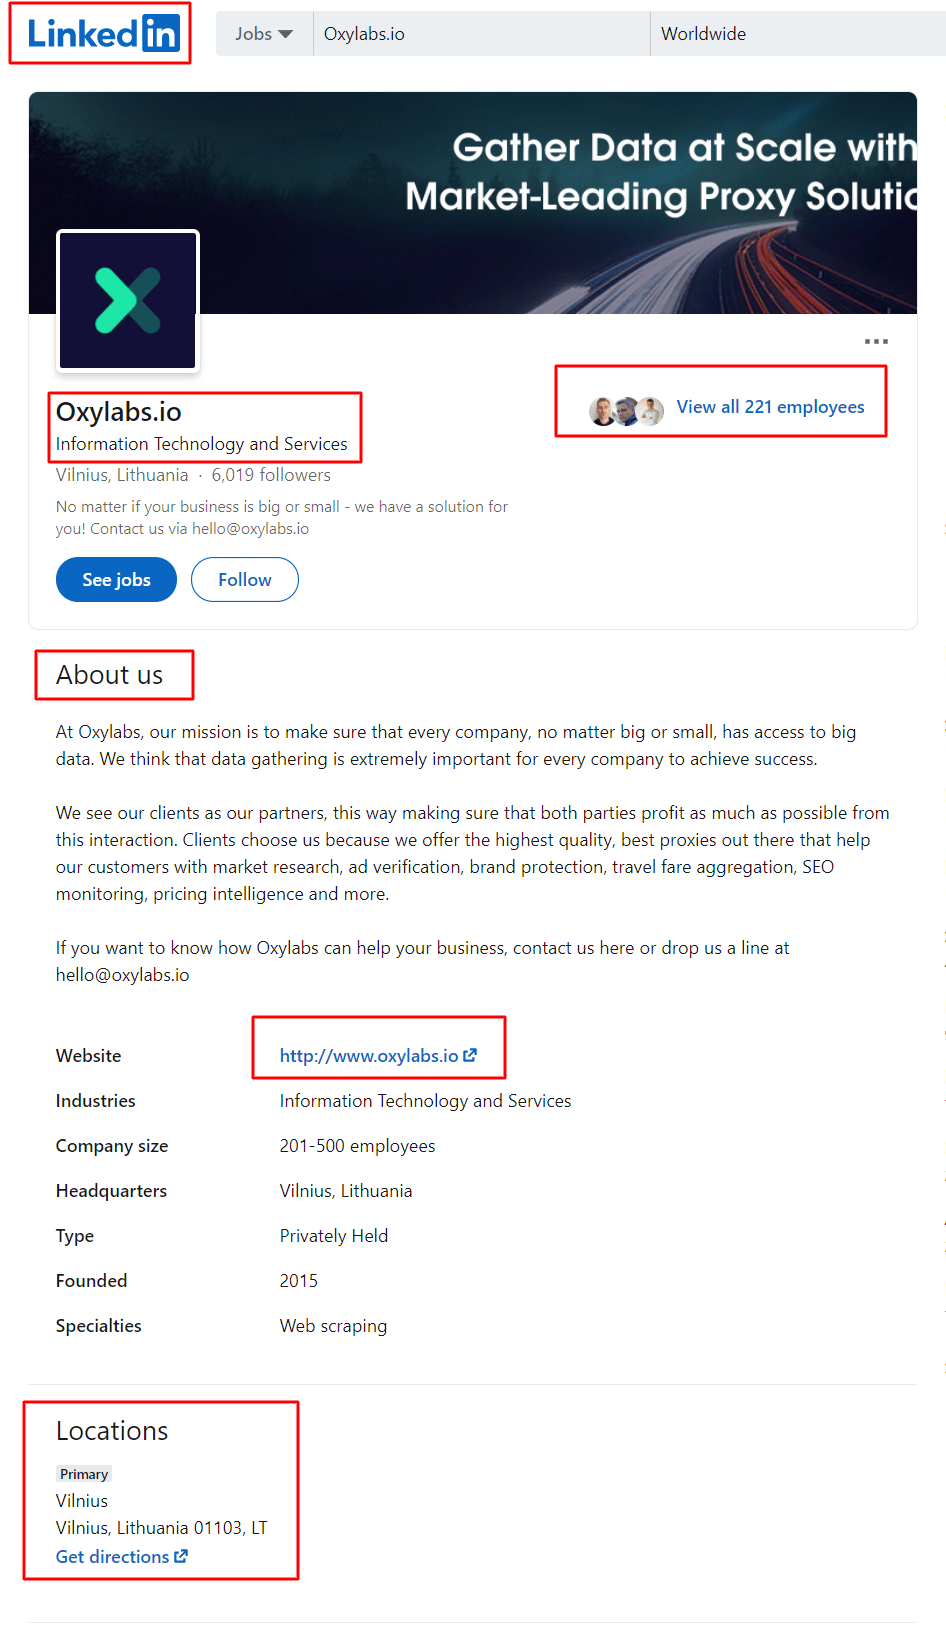 Oxylabs-io-LinkedIn